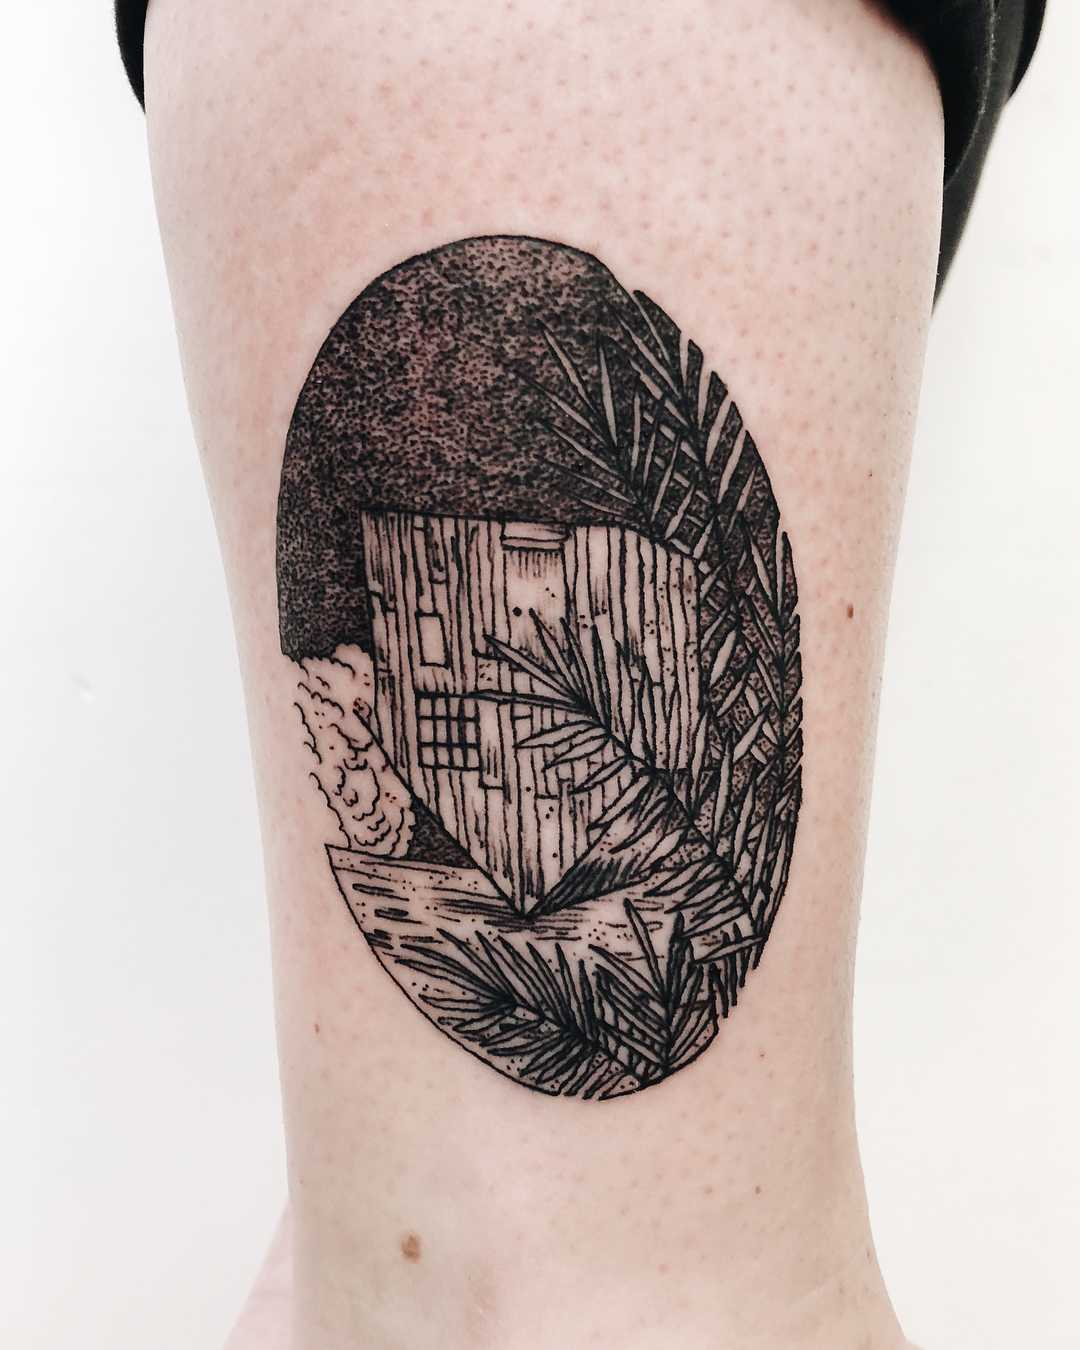 An upside down home tattoo